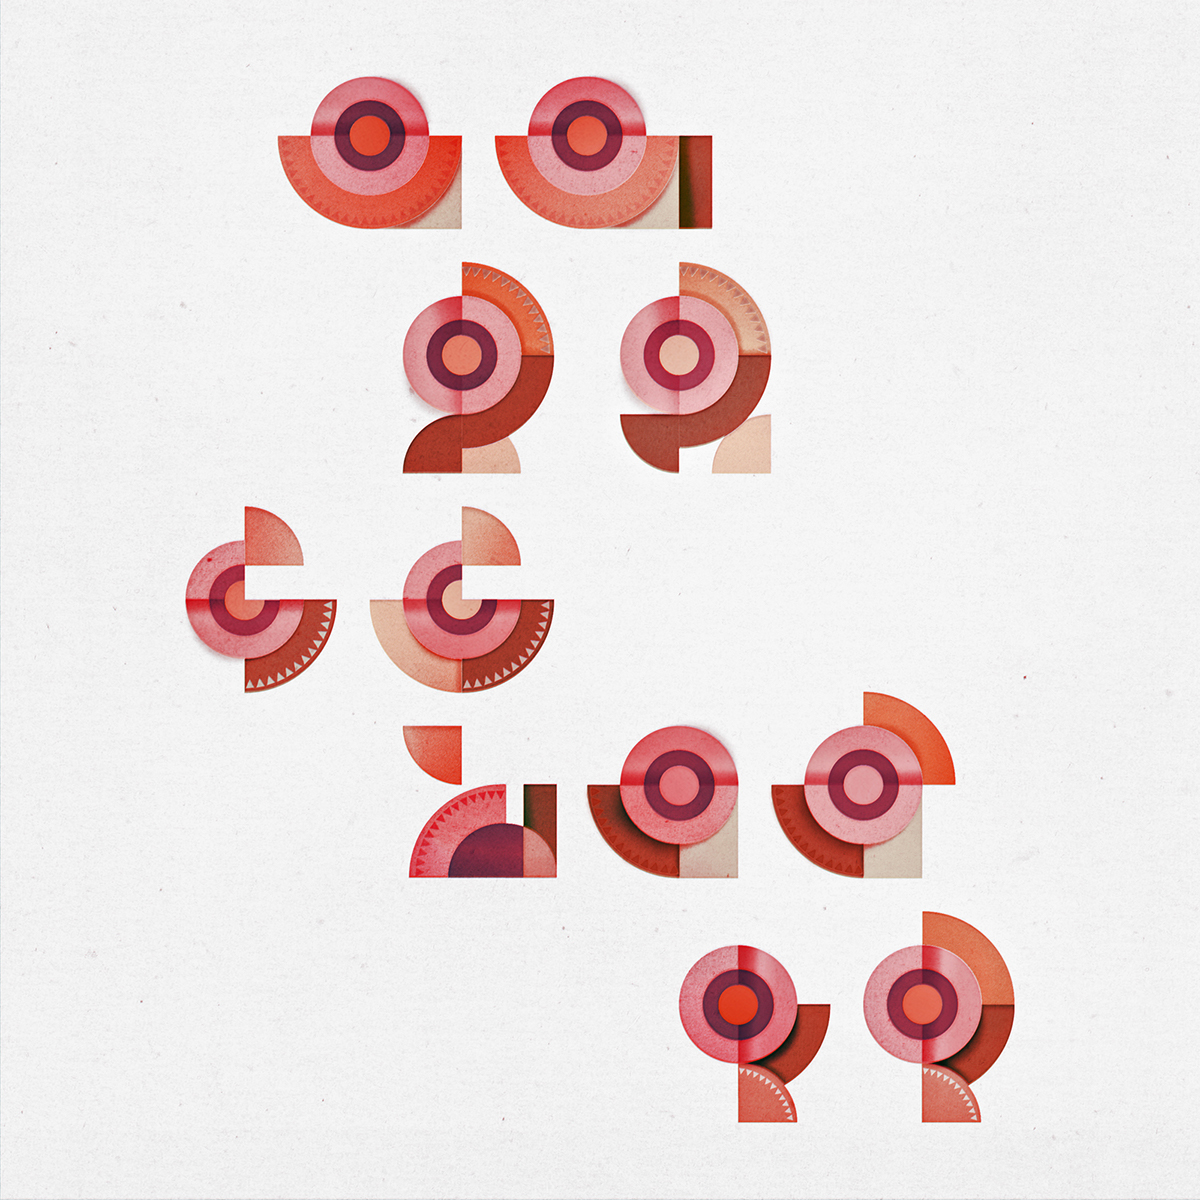 bangla bengali shworoborno shoroborno বাংলা স্বরবর্ণ একুশ ekush typography   Typeface